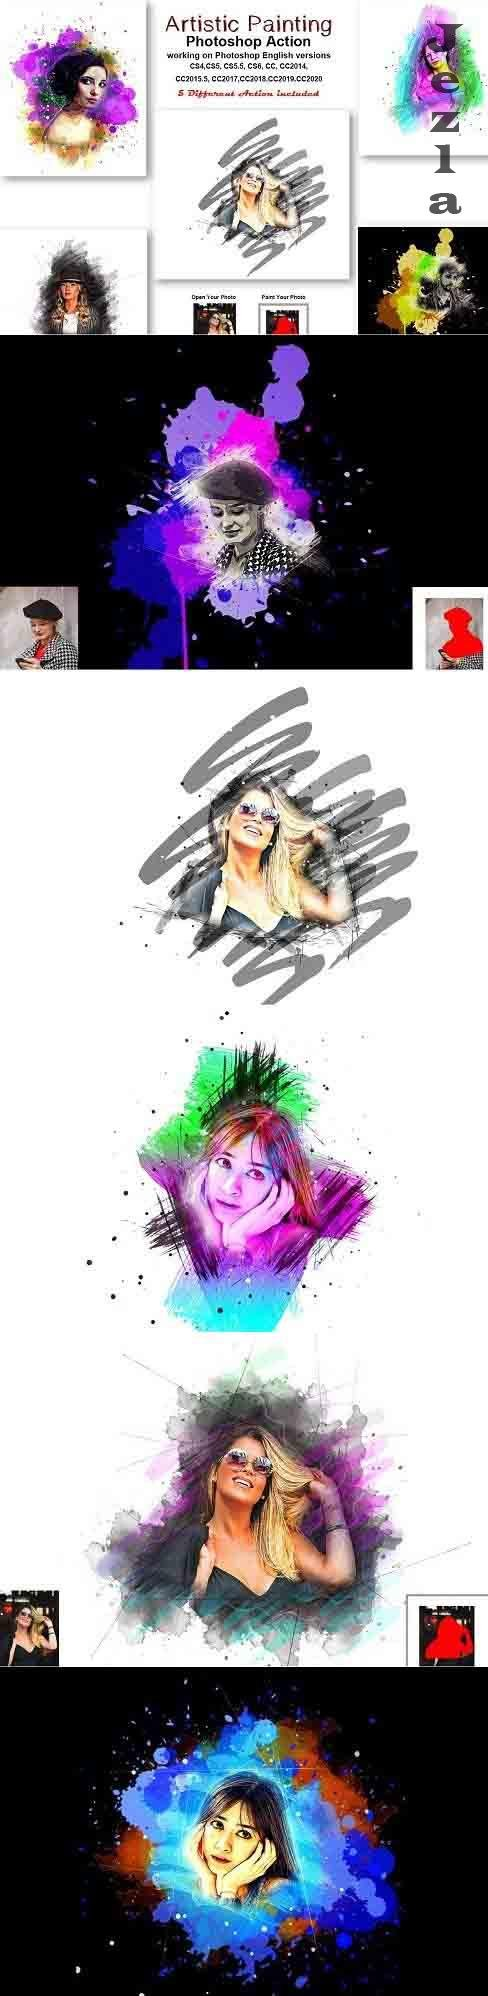 CreativeMarket - Artistic Painting Photoshop Action 5429287